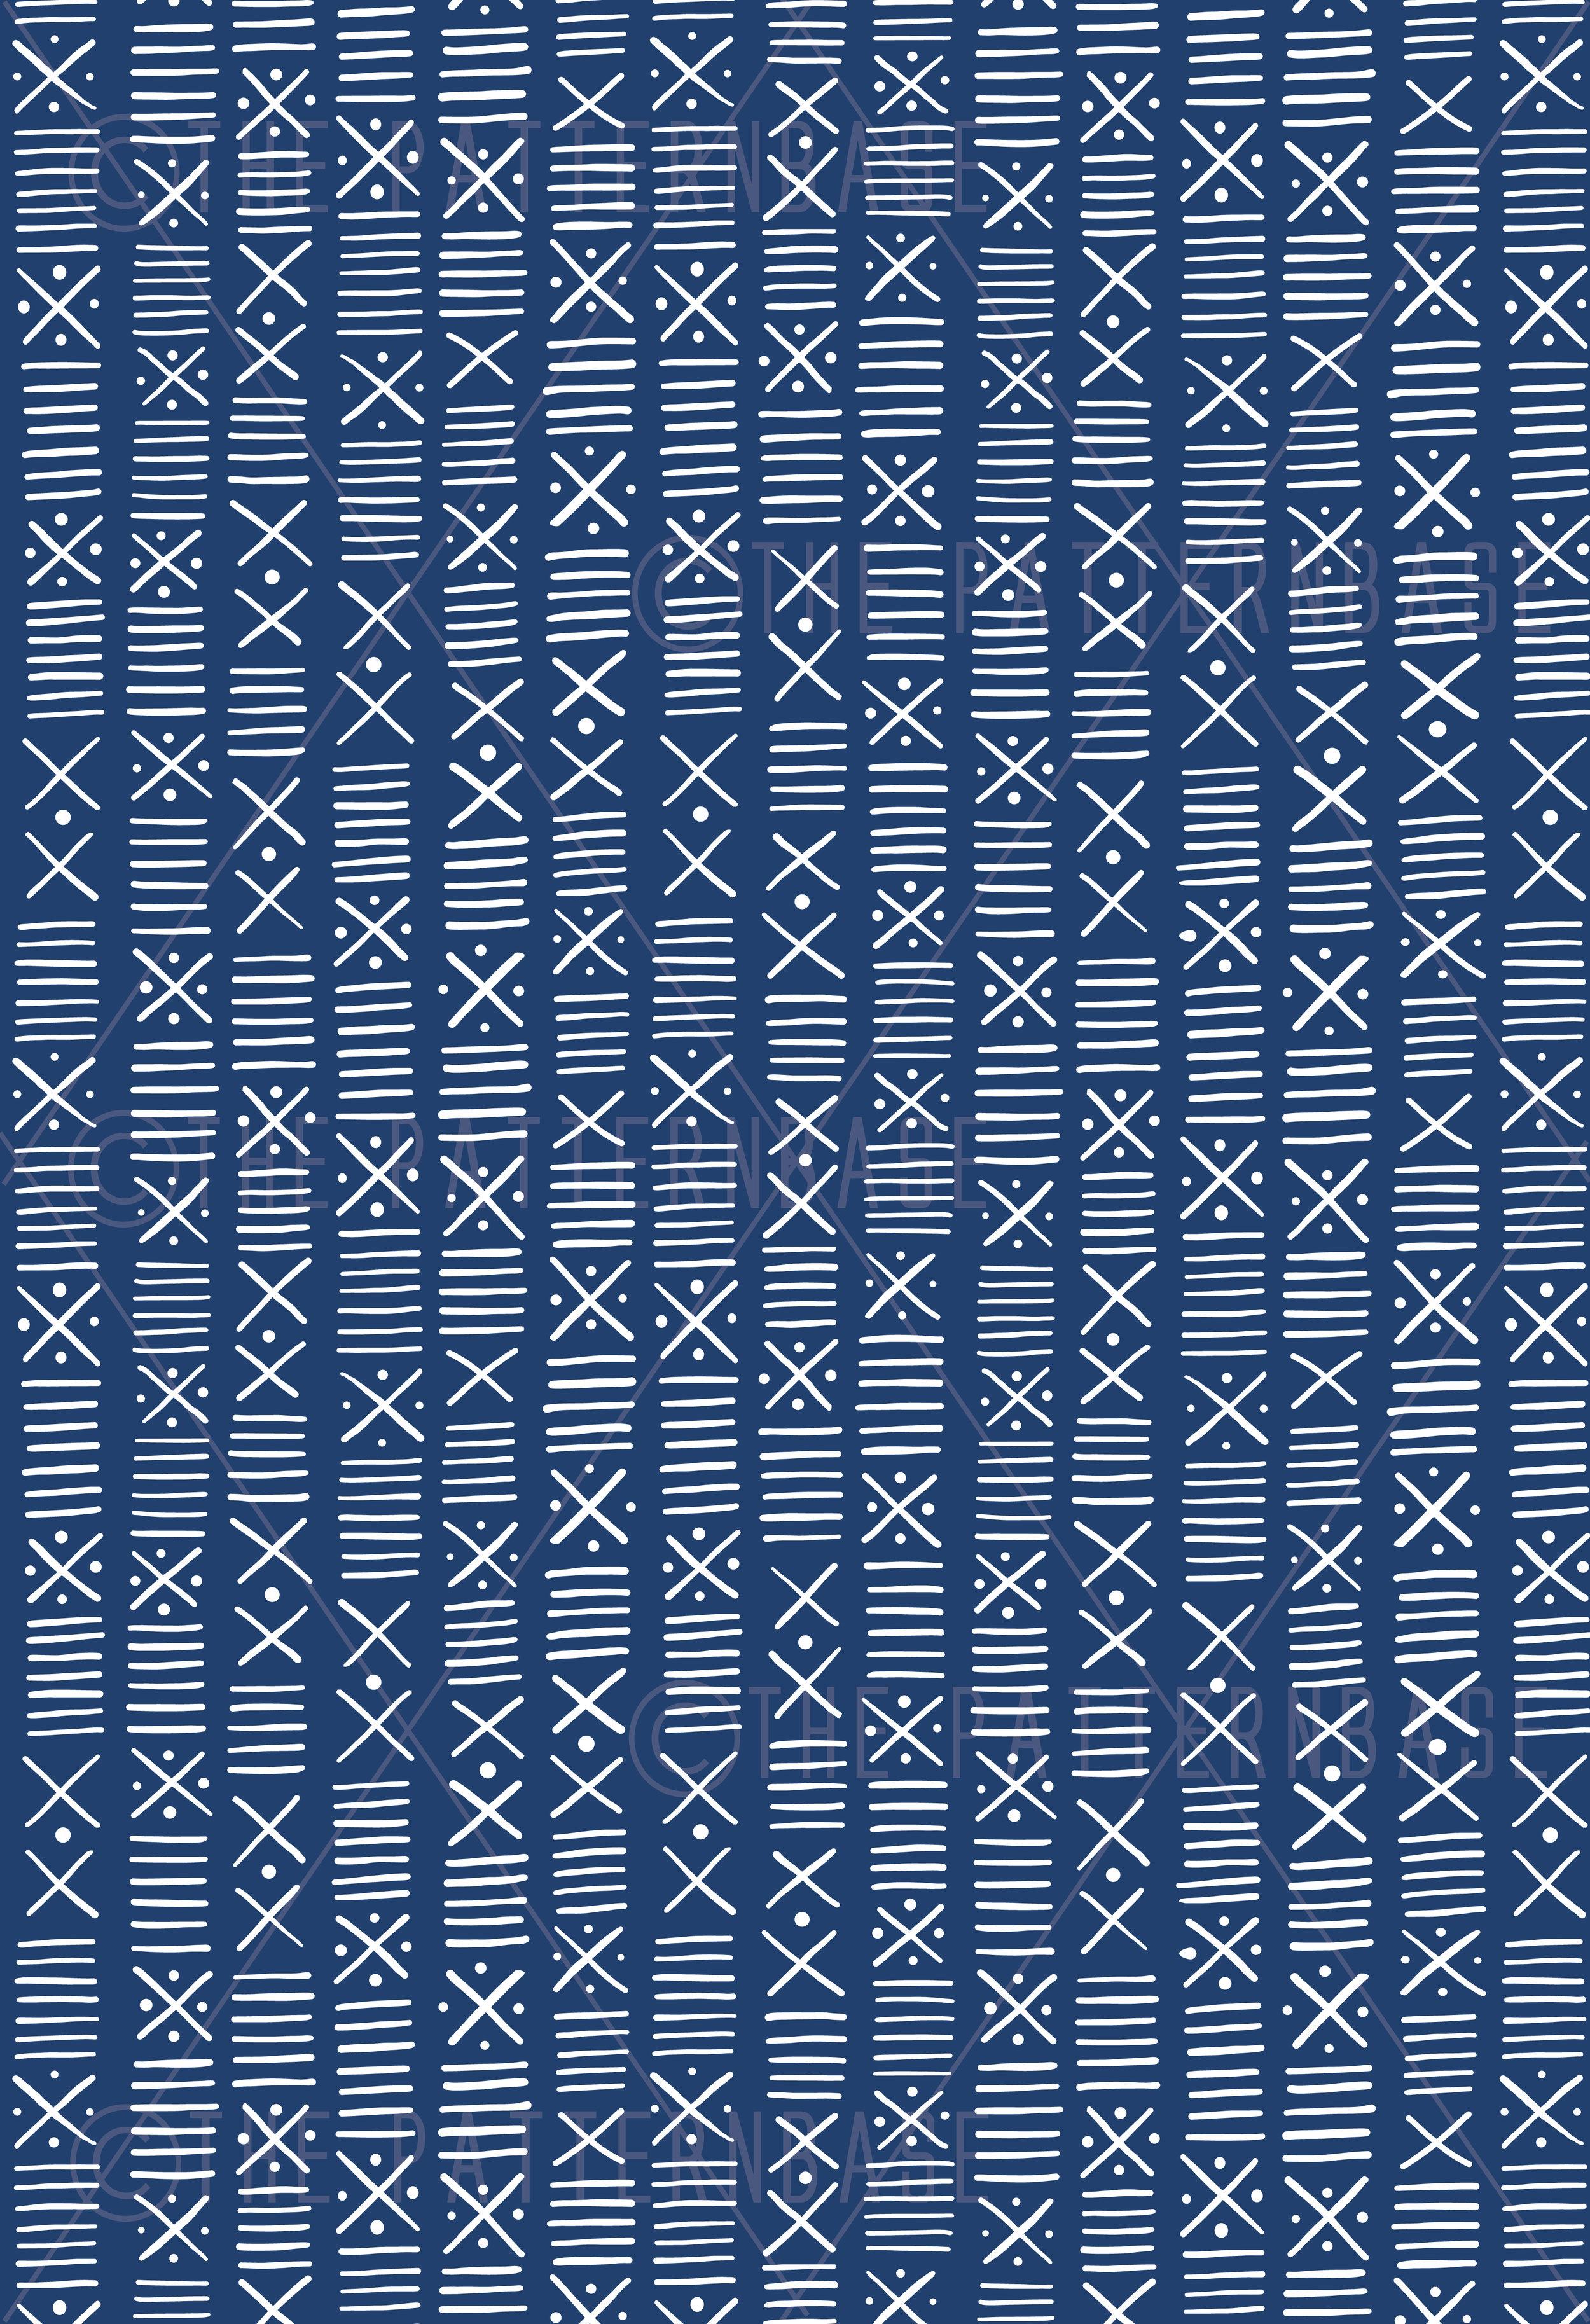 patternbase-tally-wm.jpg